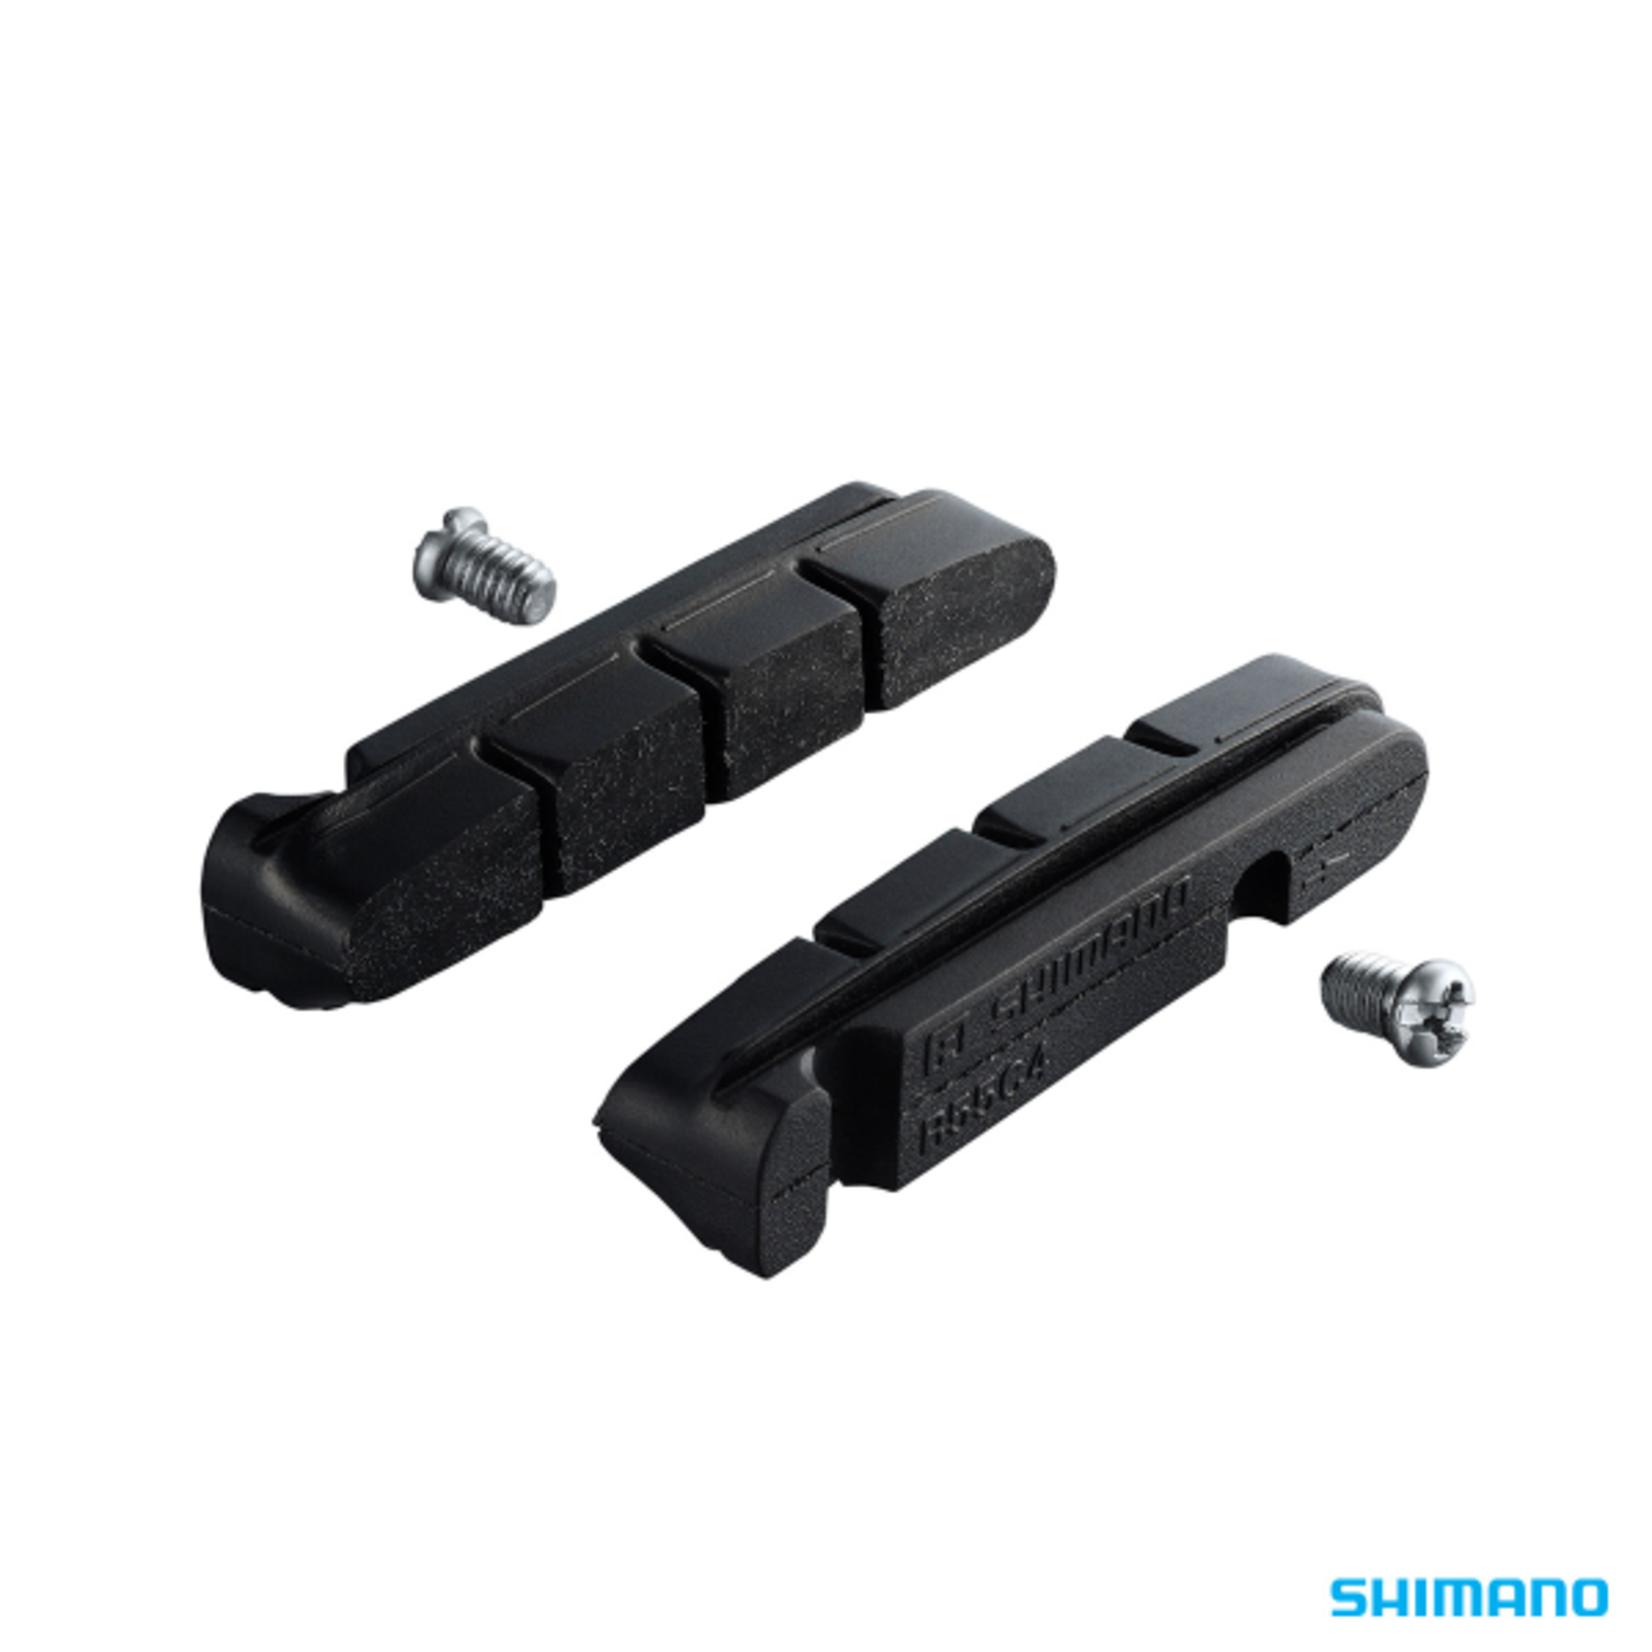 Shimano Shimano, BR-9000 Brake Pad Inserts R55C4 For Alloy Rims (2 PAIR)